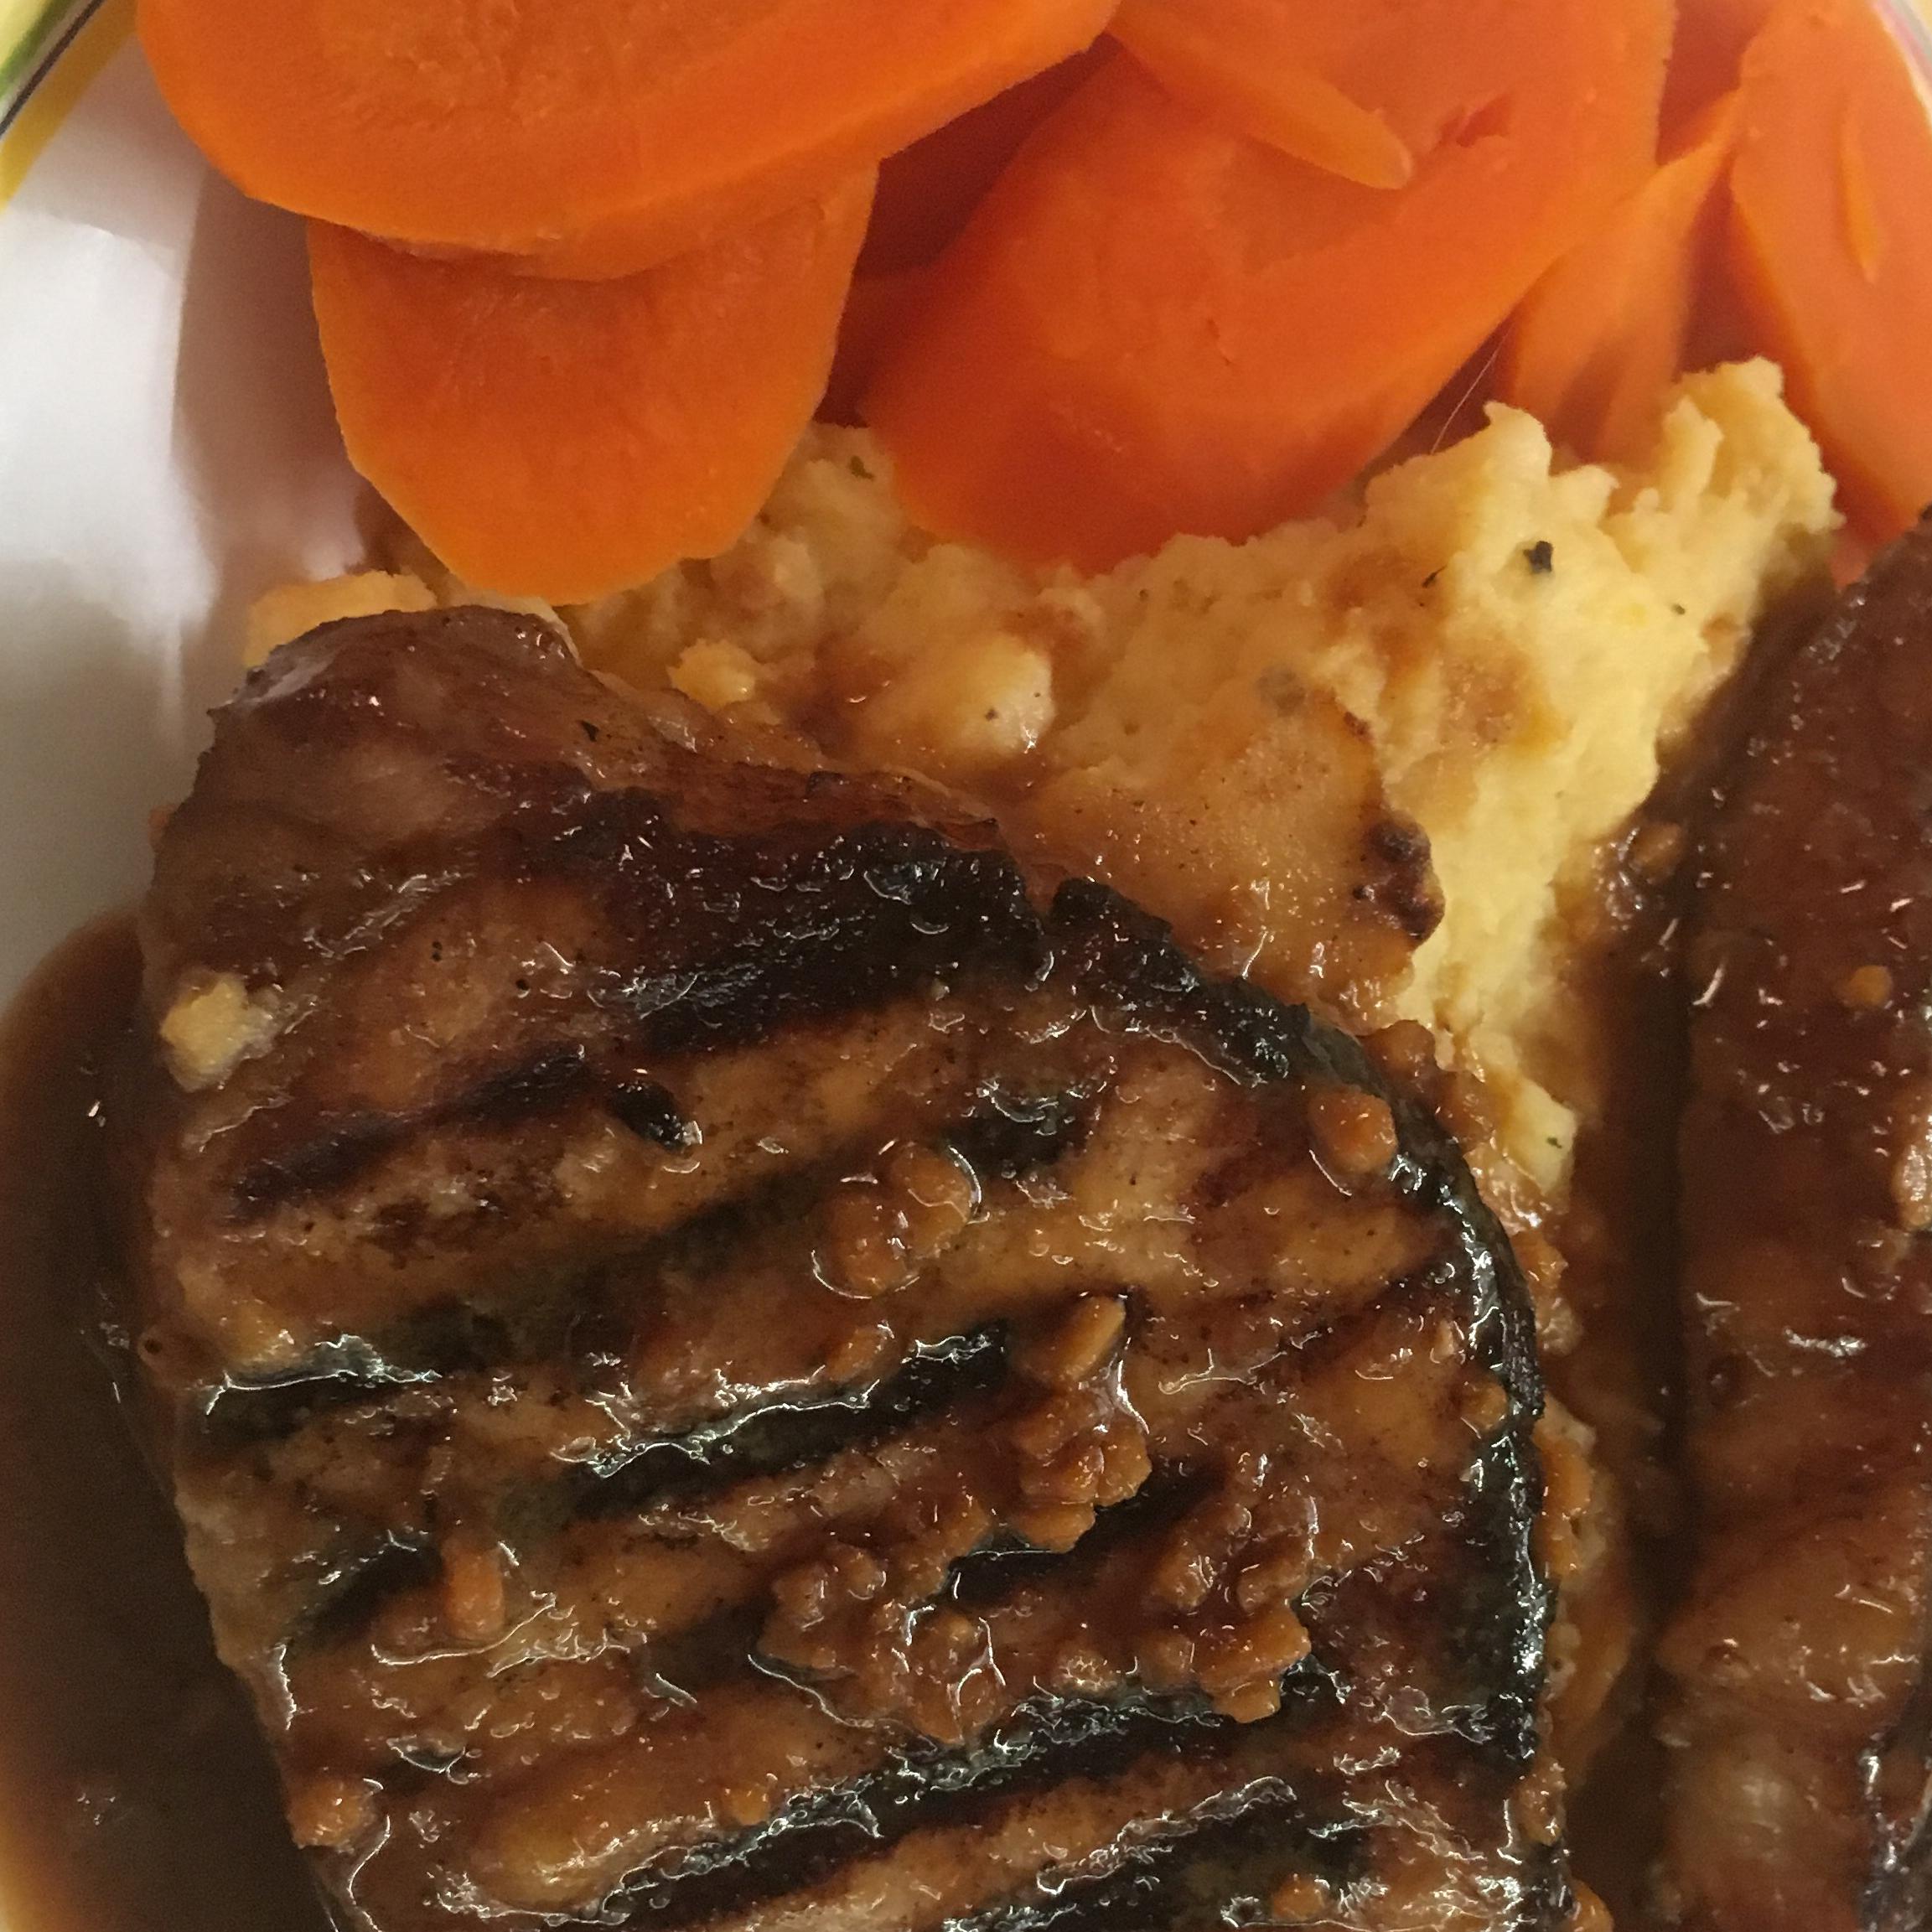 Sheila's Grilled Pork Tenderloin genechristopher